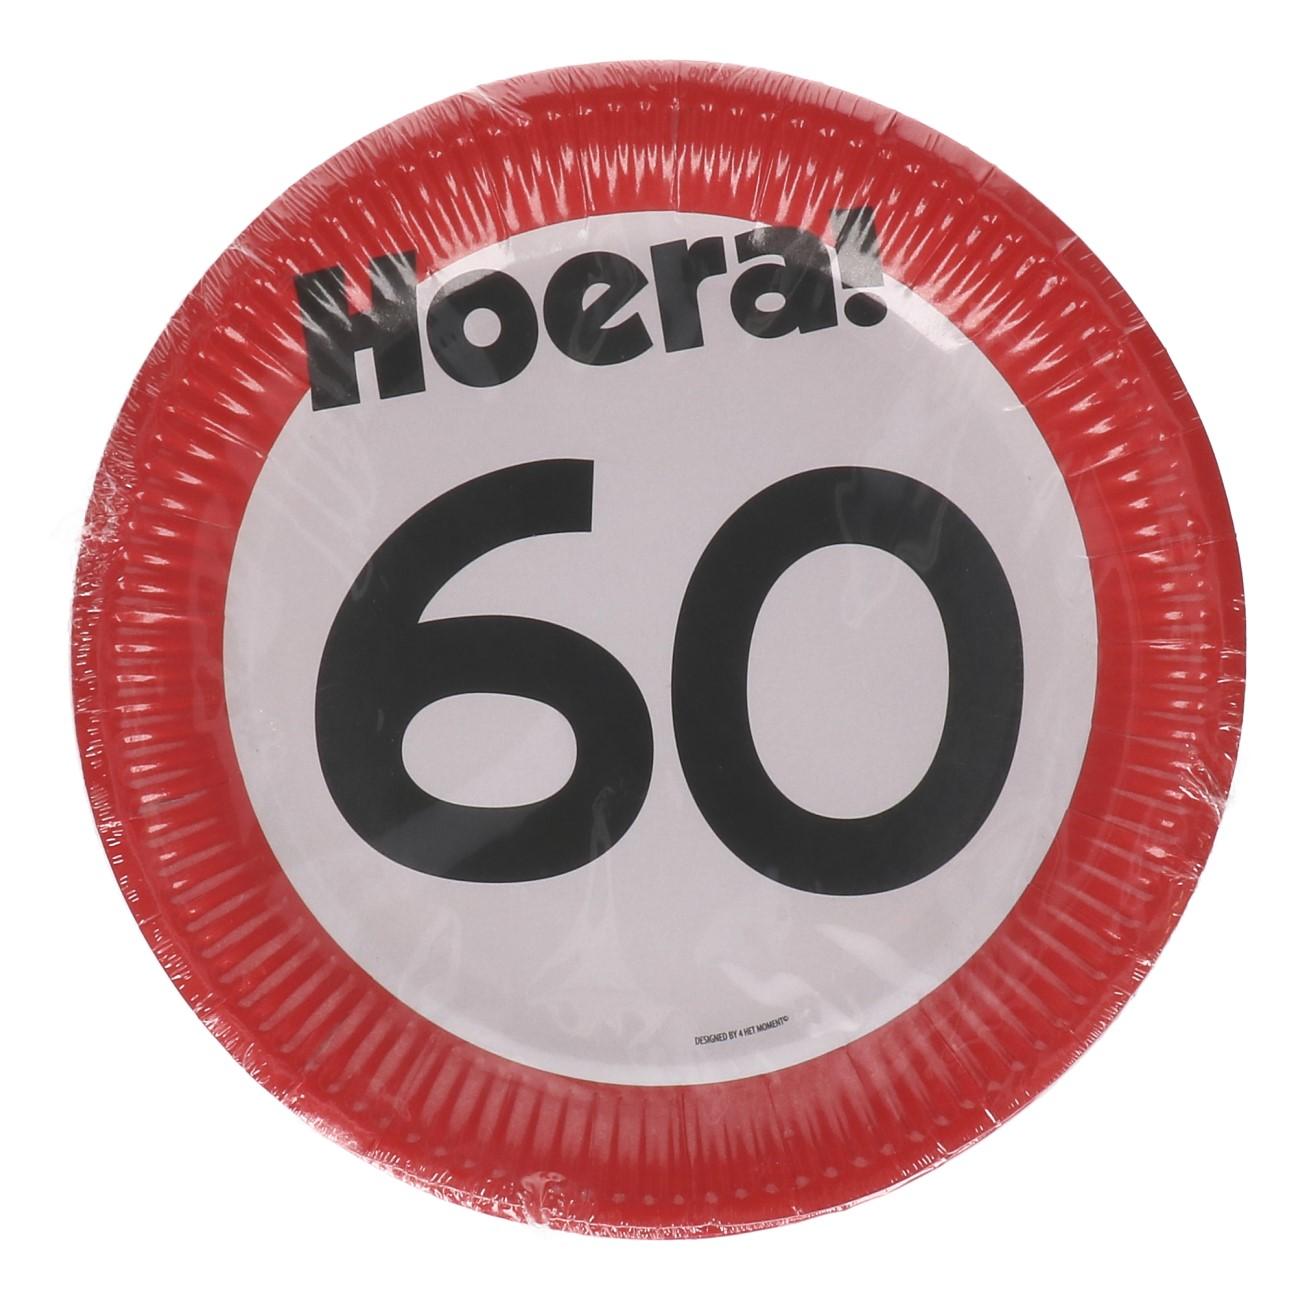 Bordjes 60 jaar